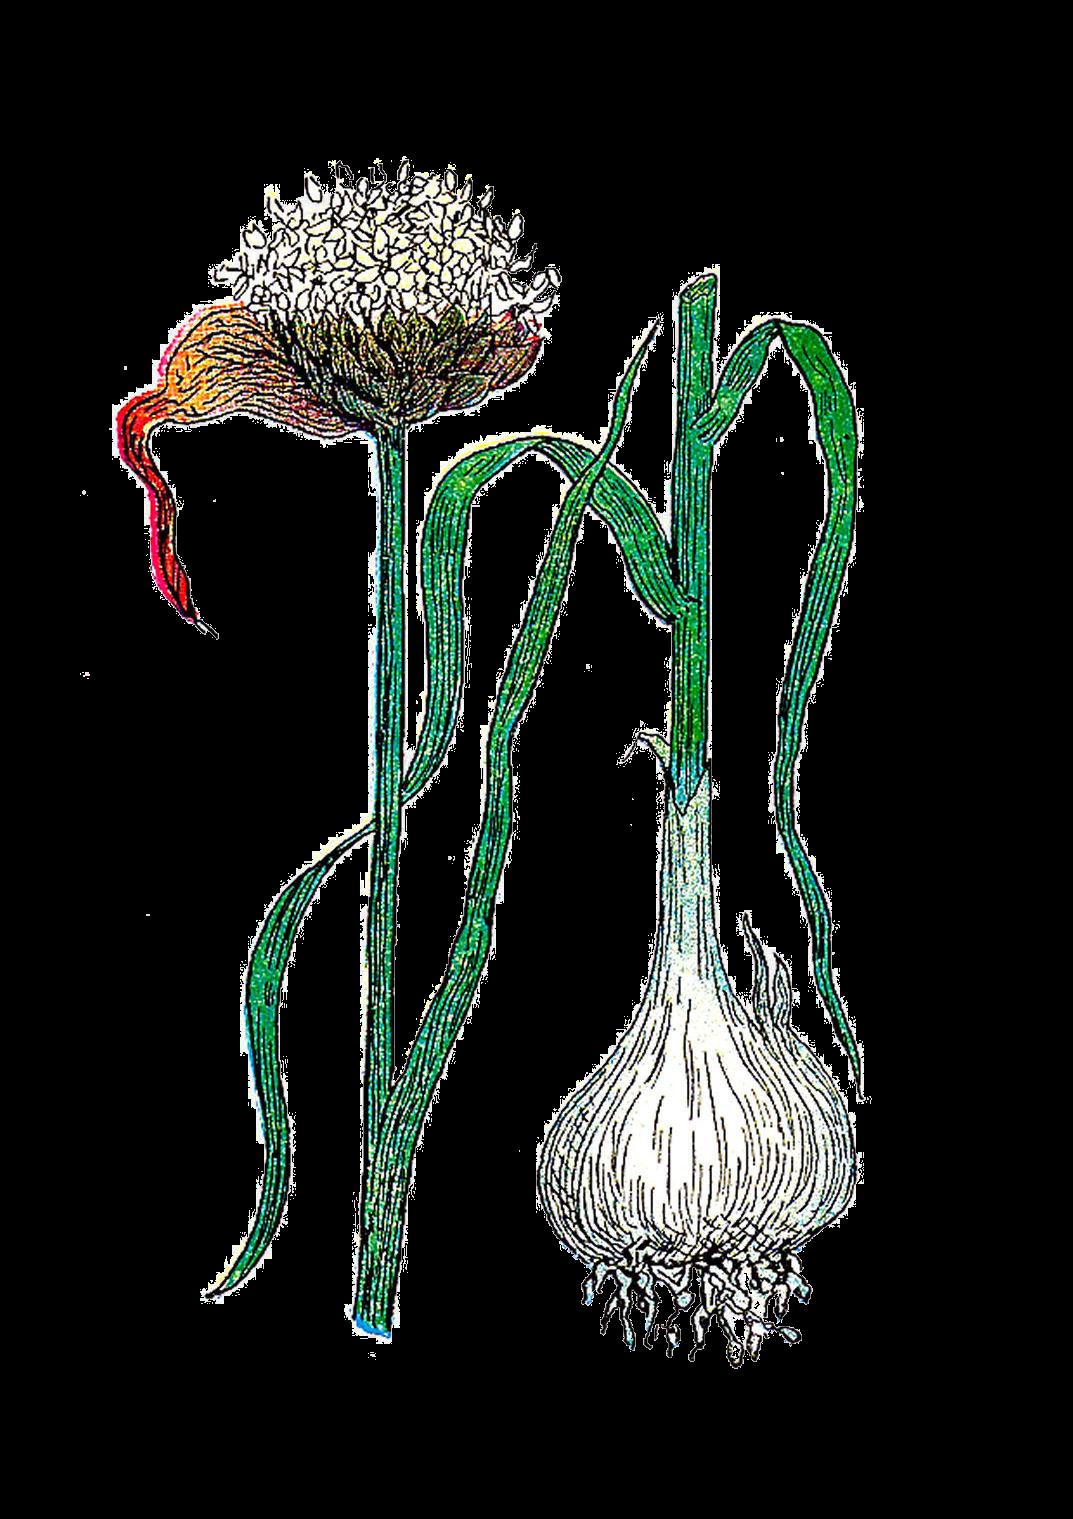 Antique images free botanical. Garlic clipart garlic plant